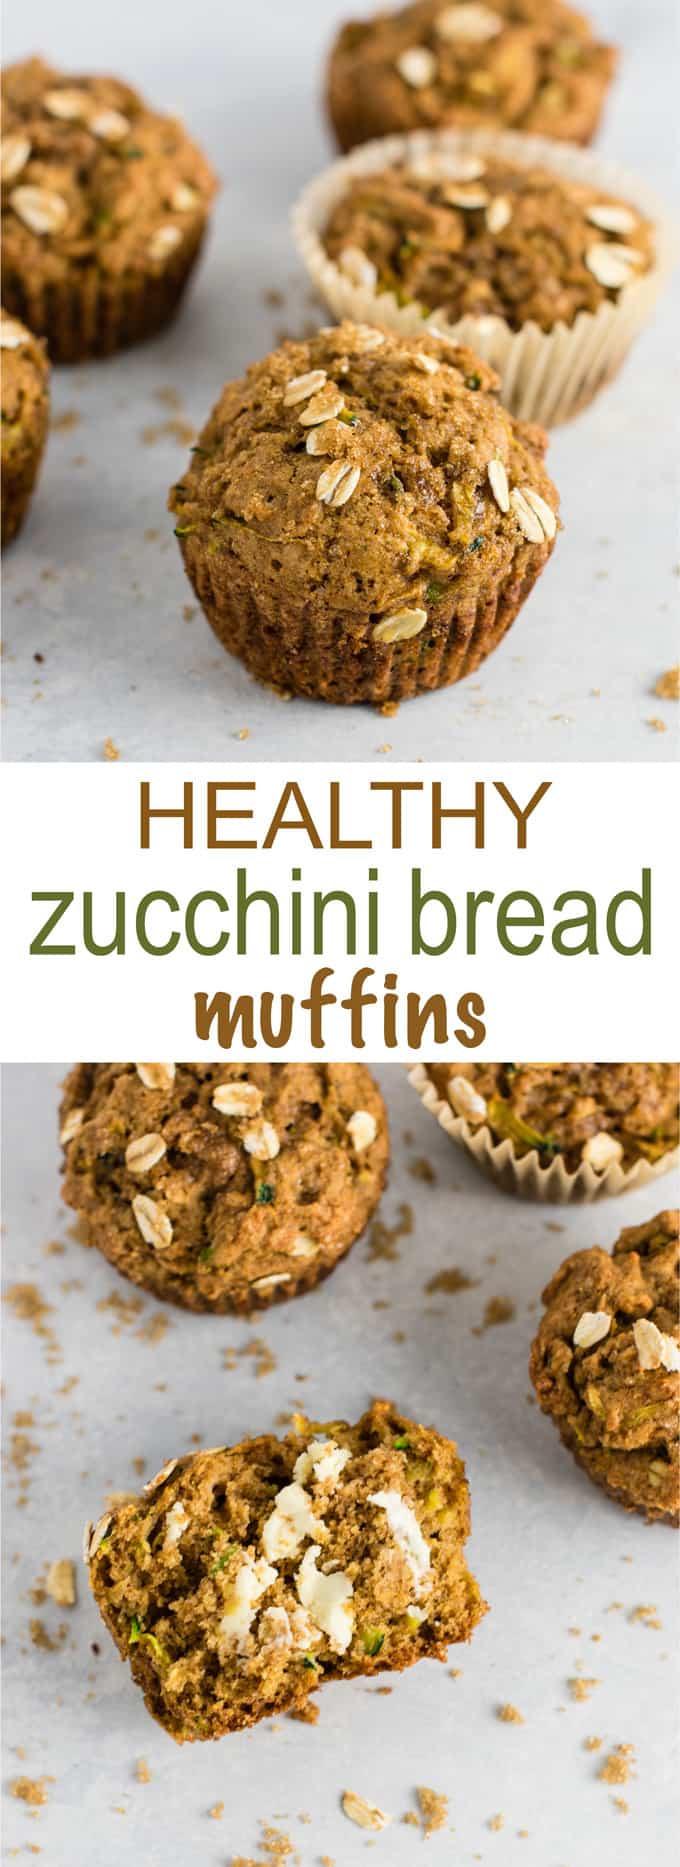 Healthy Zucchini Bread Recipe Applesauce  Healthy Zucchini Bread Muffins with brown sugar